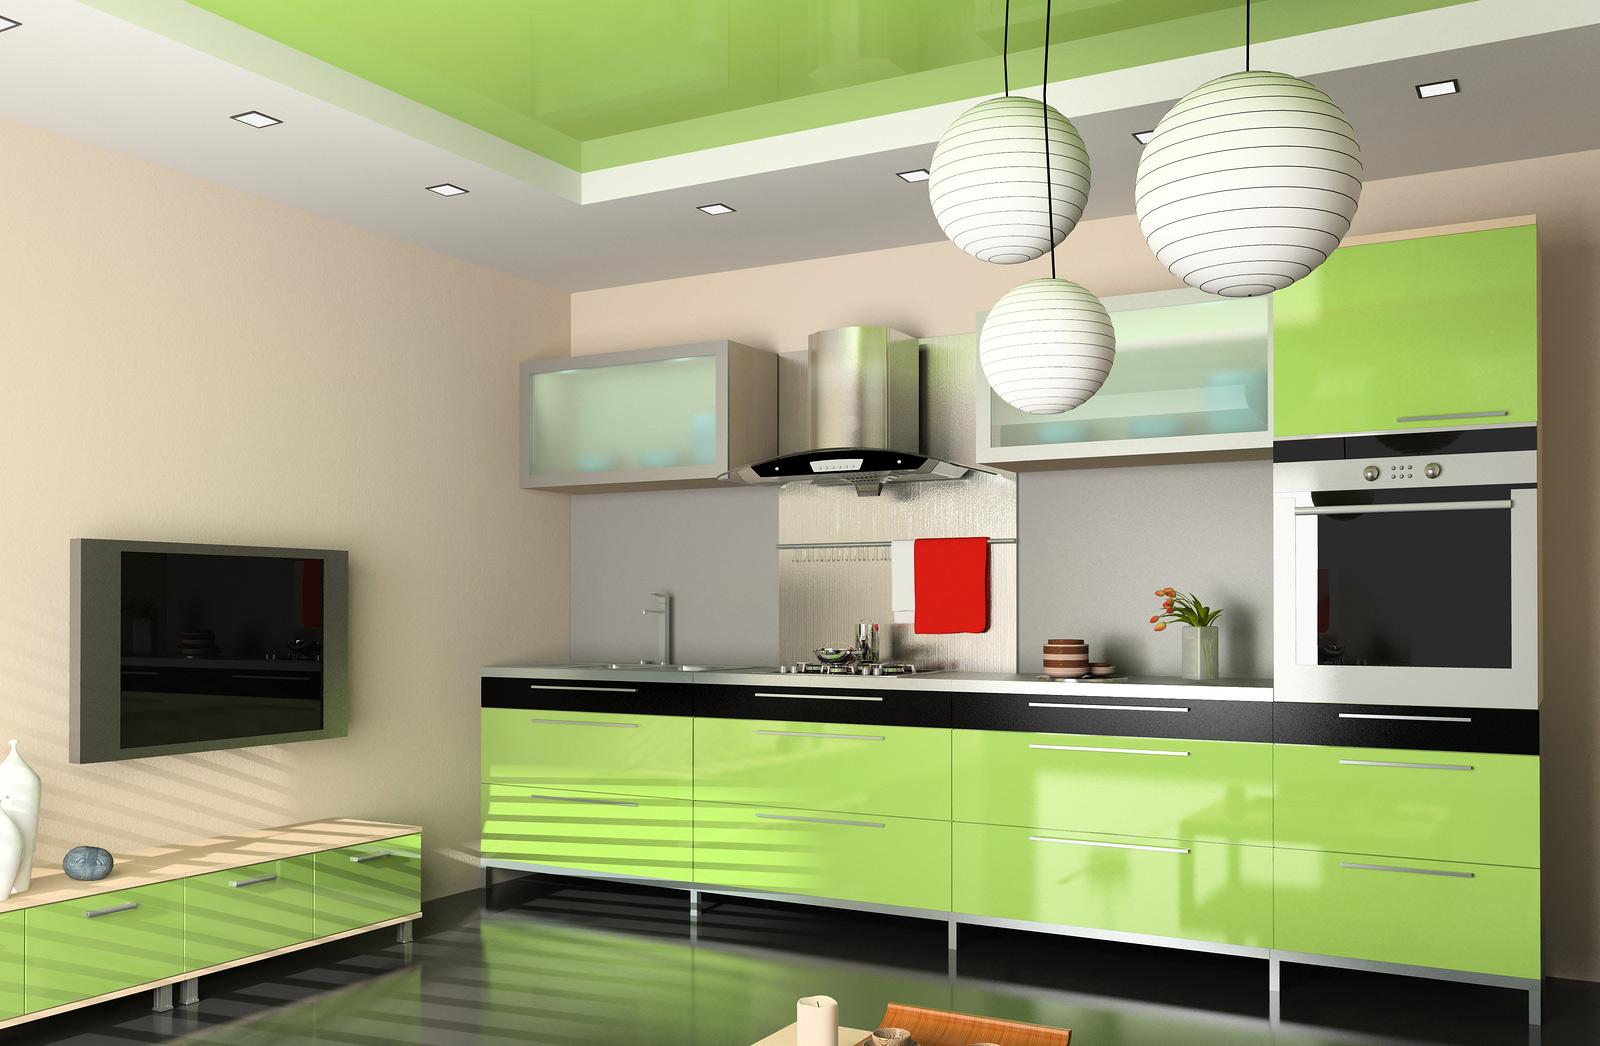 Кухня оливковая в стиле модерн